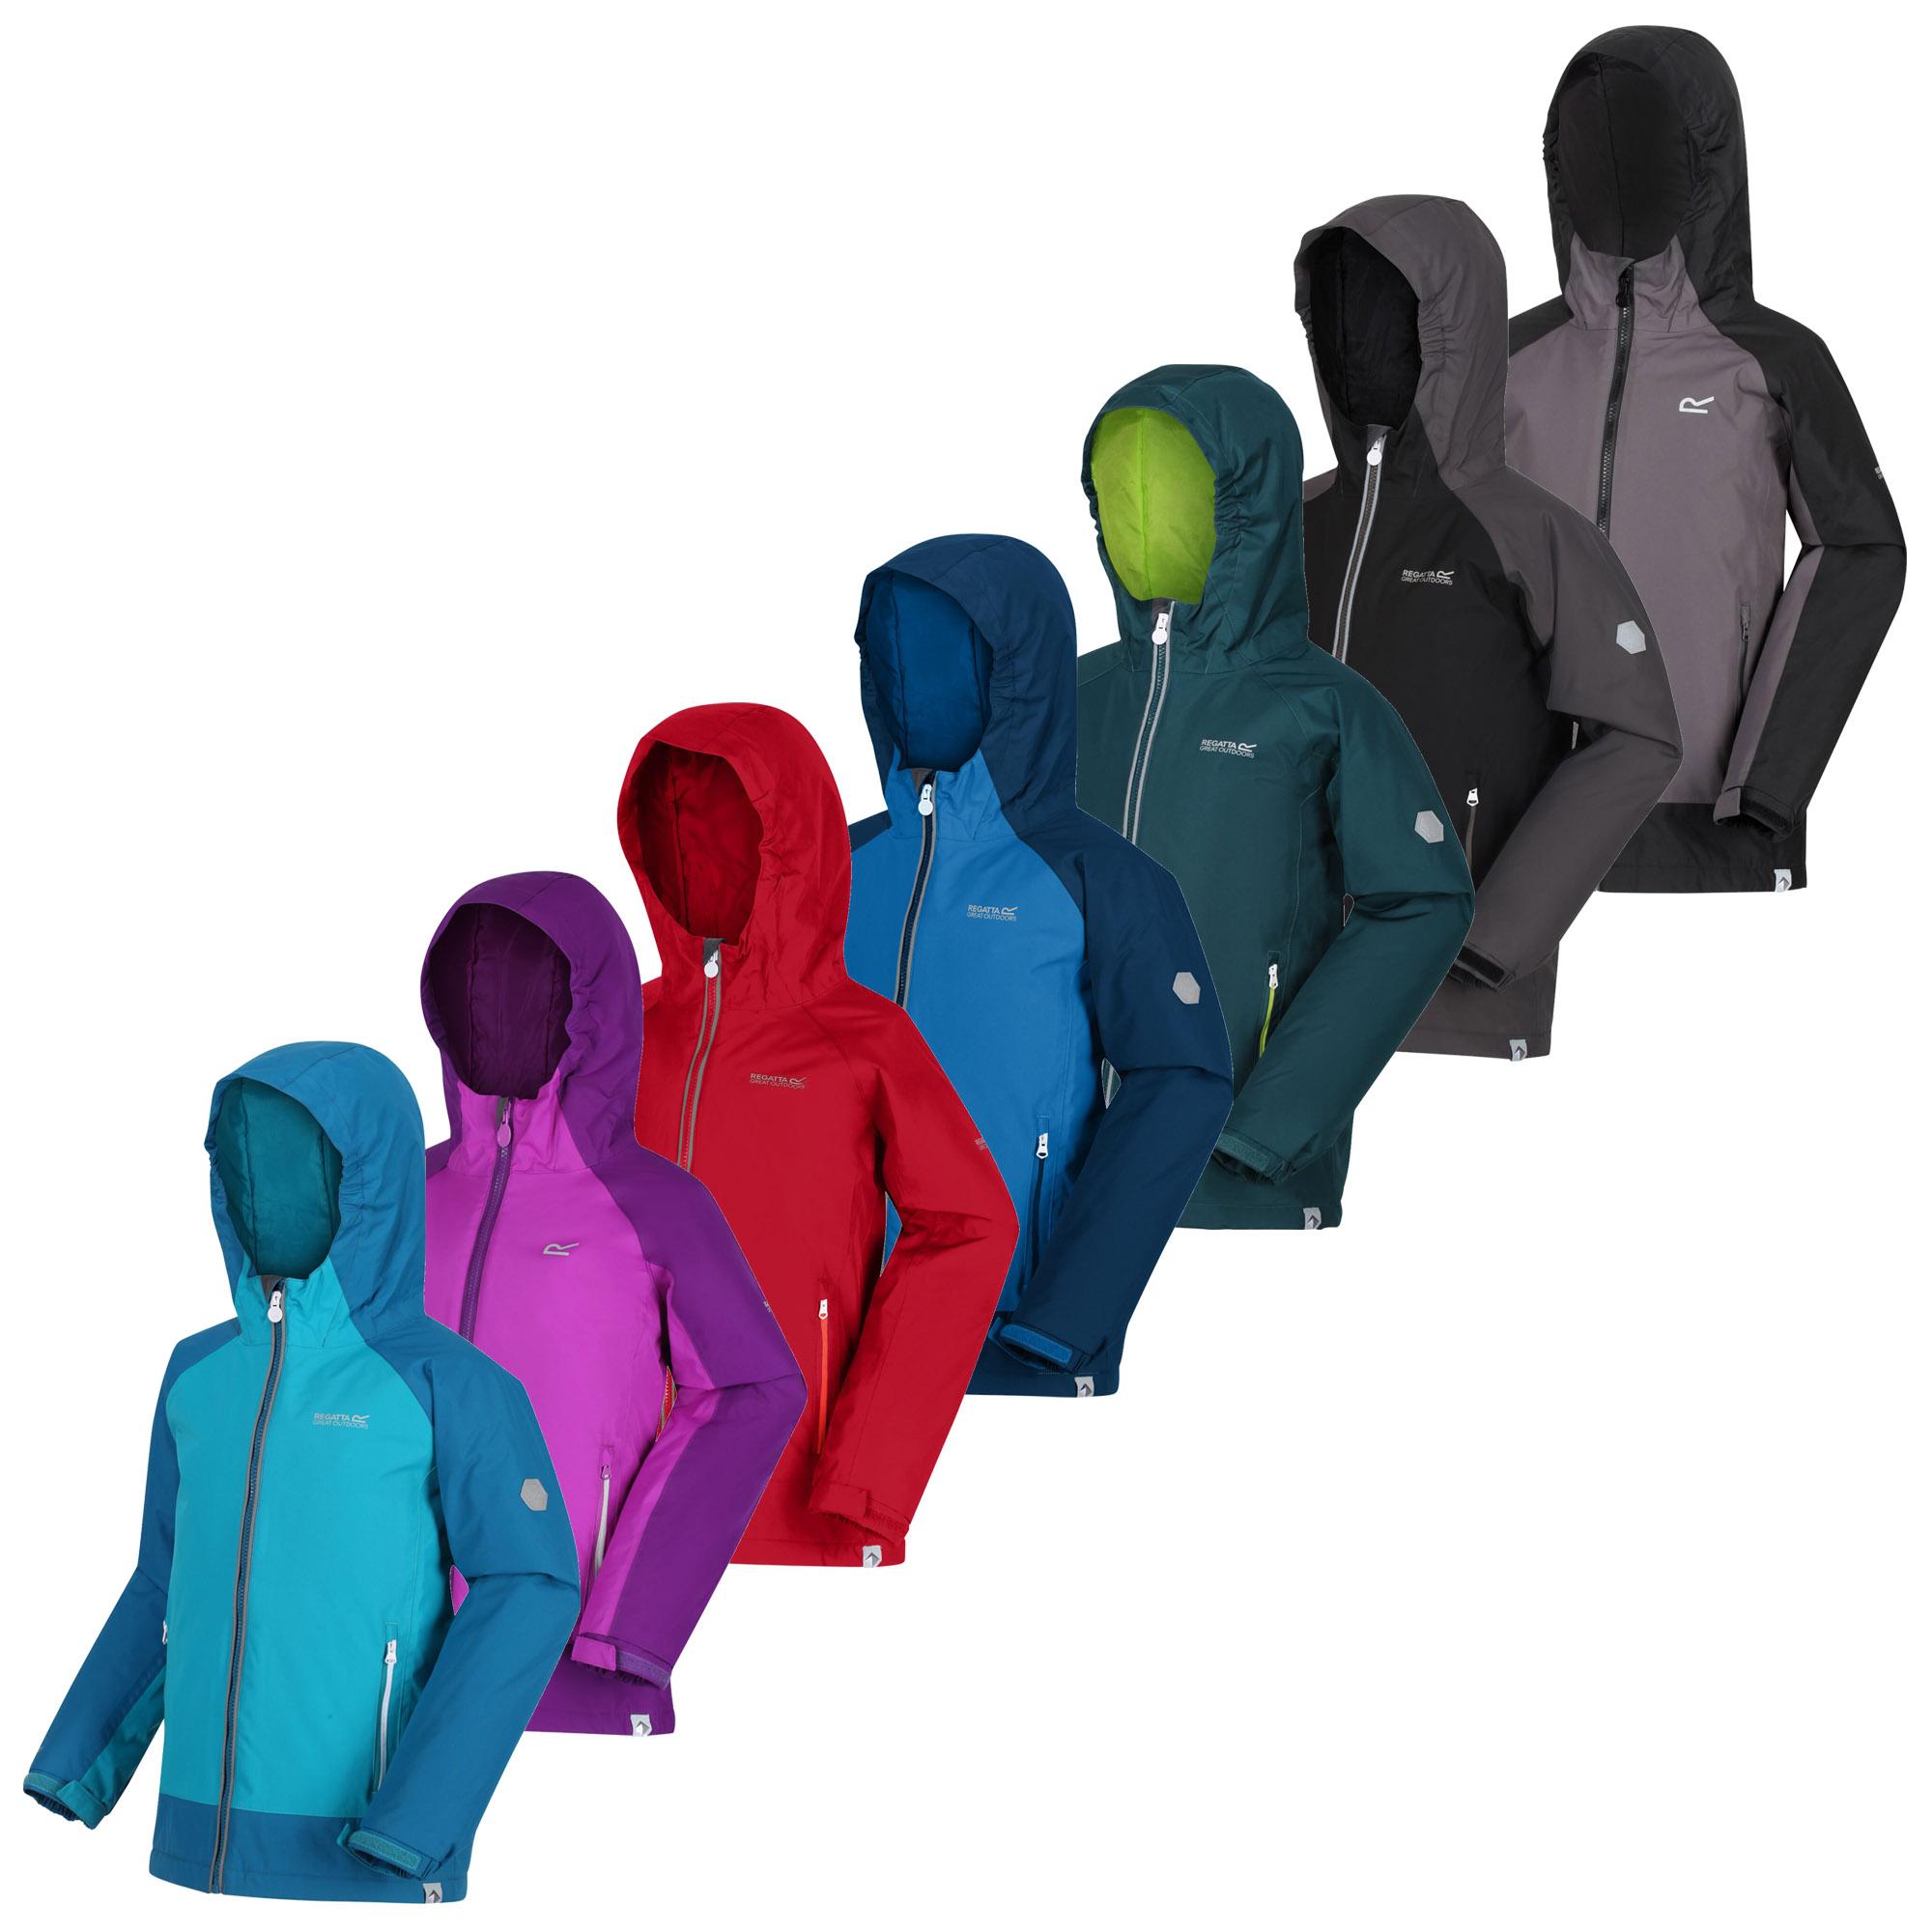 Regatta Hurdle Iii Insulated Waterproof Jacket Chaqueta aislante impermeable Unisex ni/ños